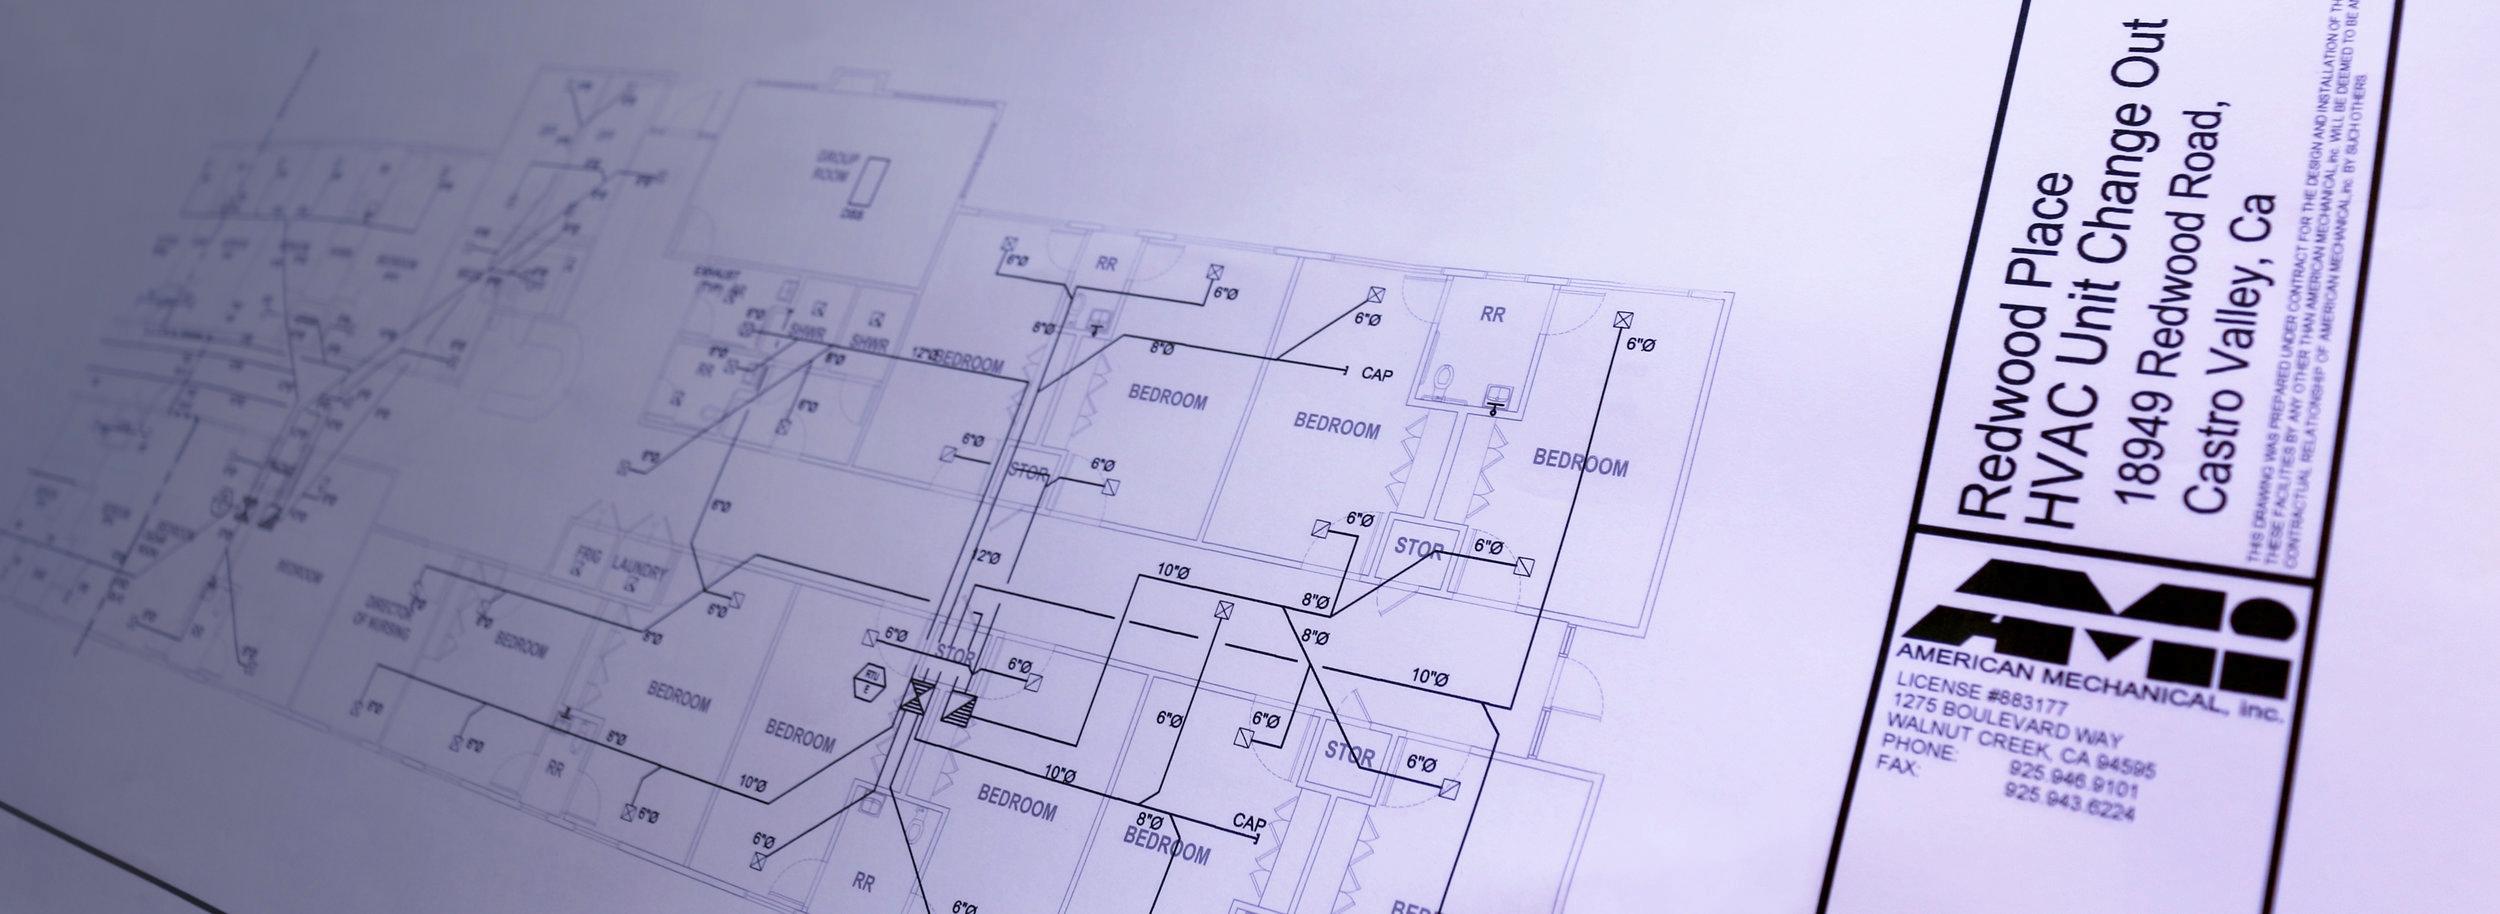 hight resolution of blueprint 3 jpg format 1500w